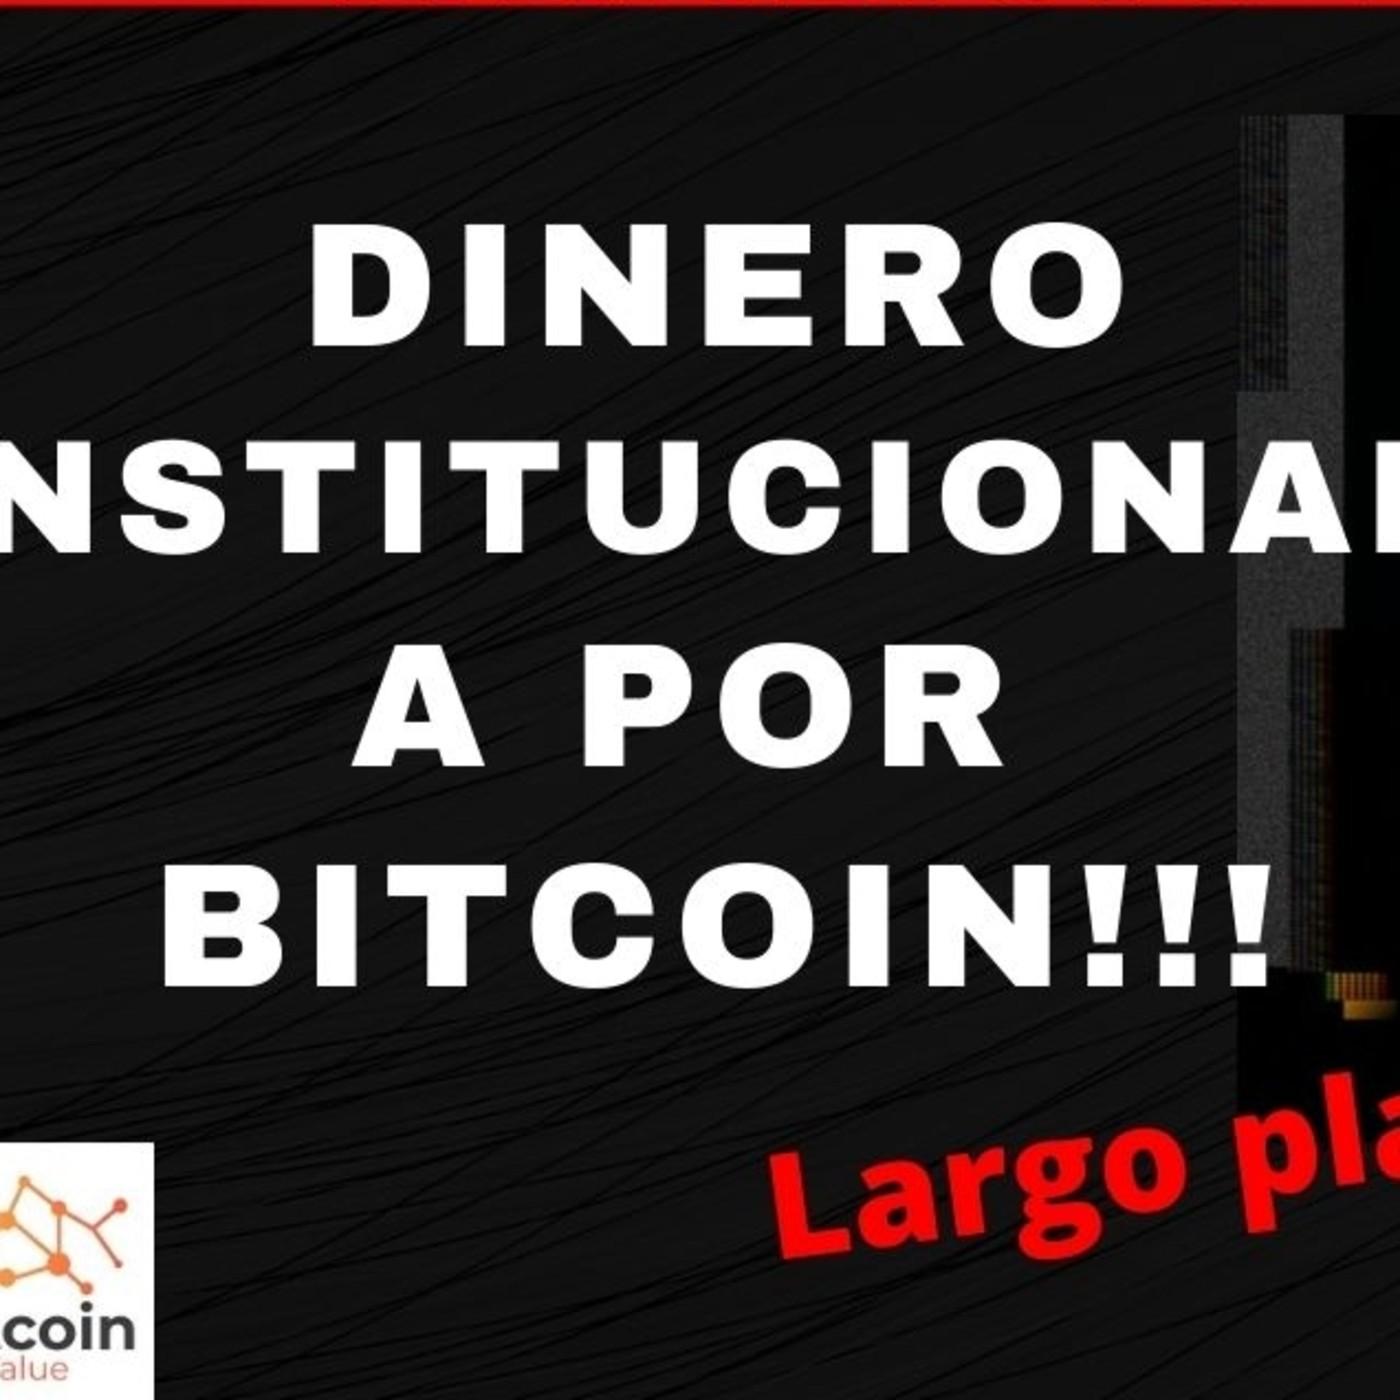 Empresa americana se refugia en BITCOIN - Análisis del precio de bitcoin